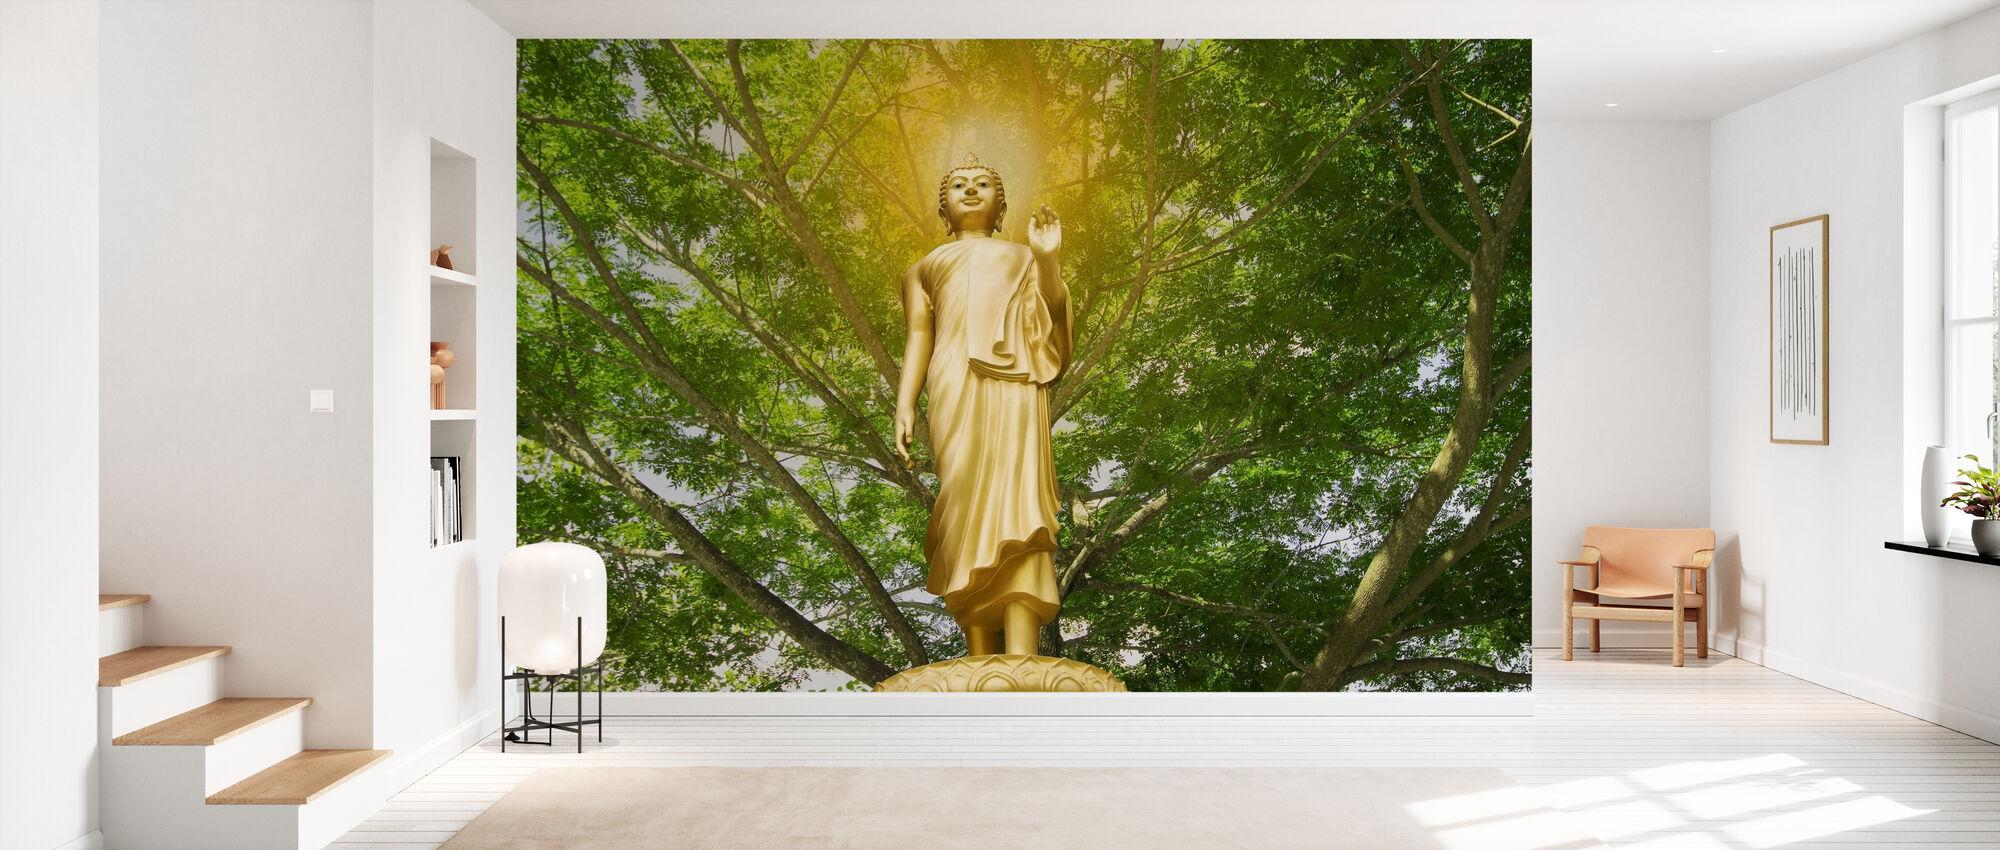 Statue of Buddha - Wallpaper - Hallway